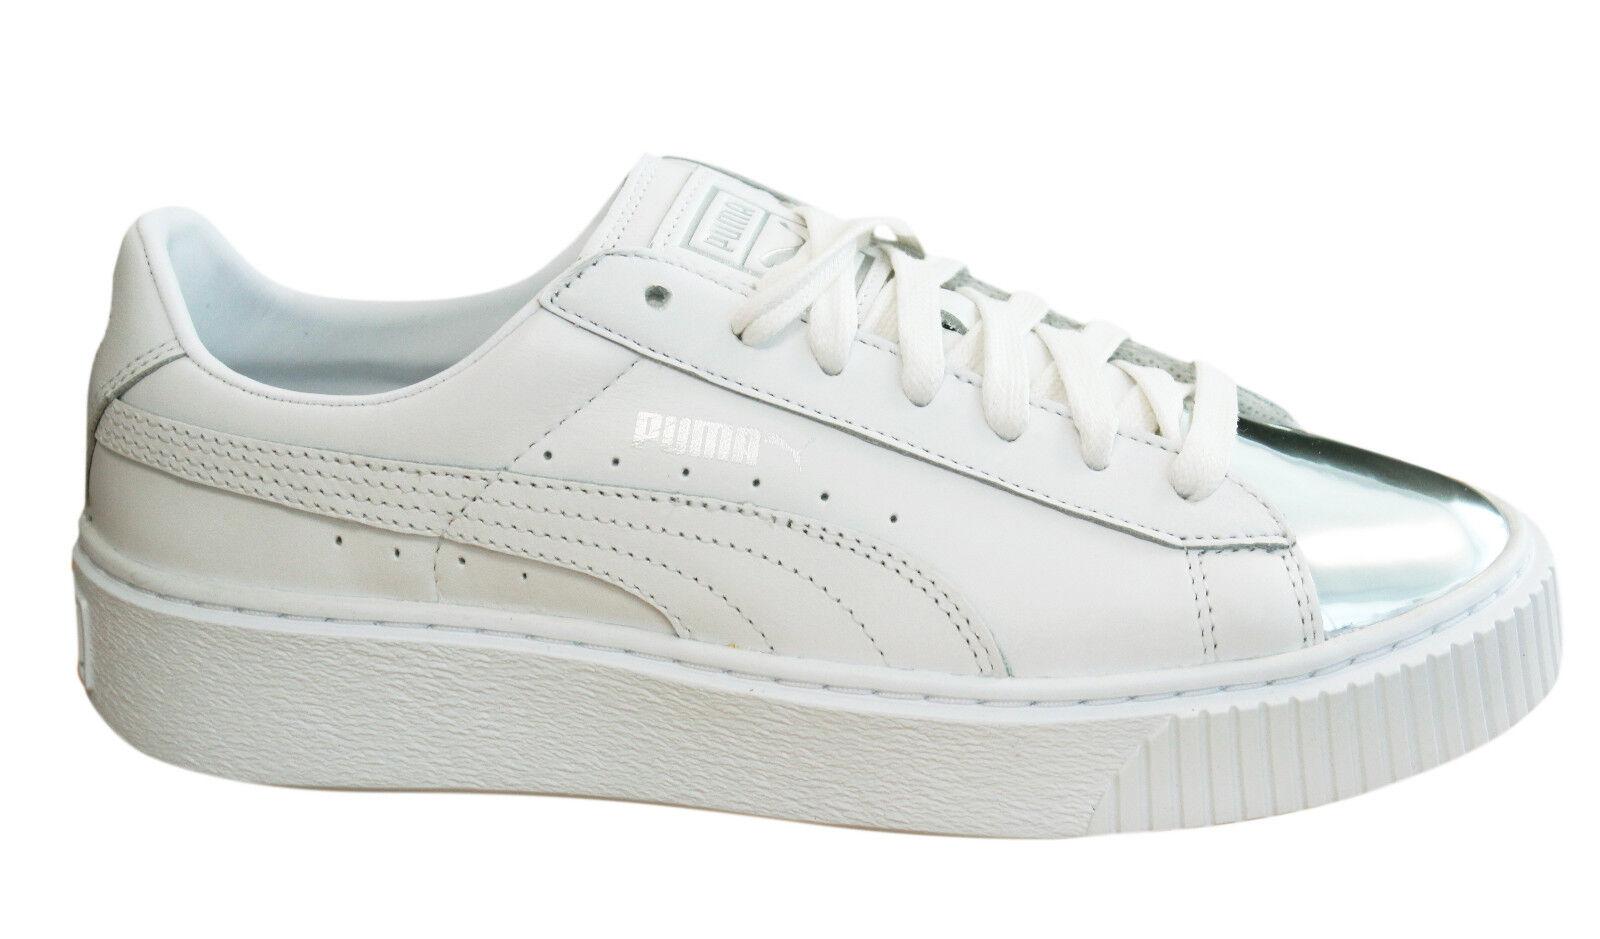 Puma Basket Classic Textile White Womens Lace Up Trainers 360356 01 B12C